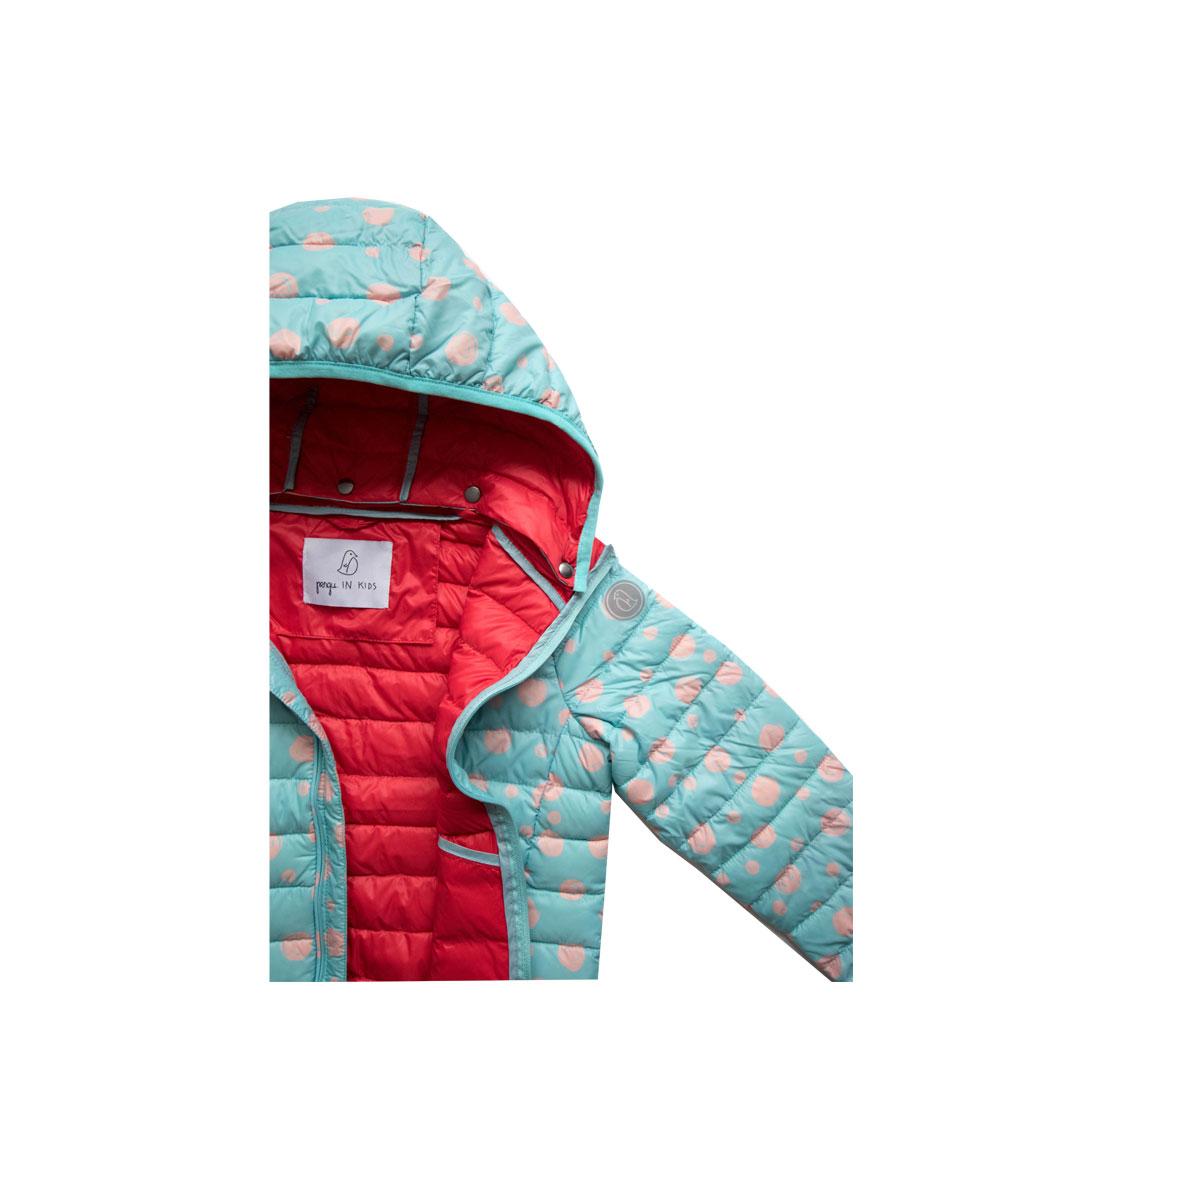 Pengu KIDS kids ultra light down jacket